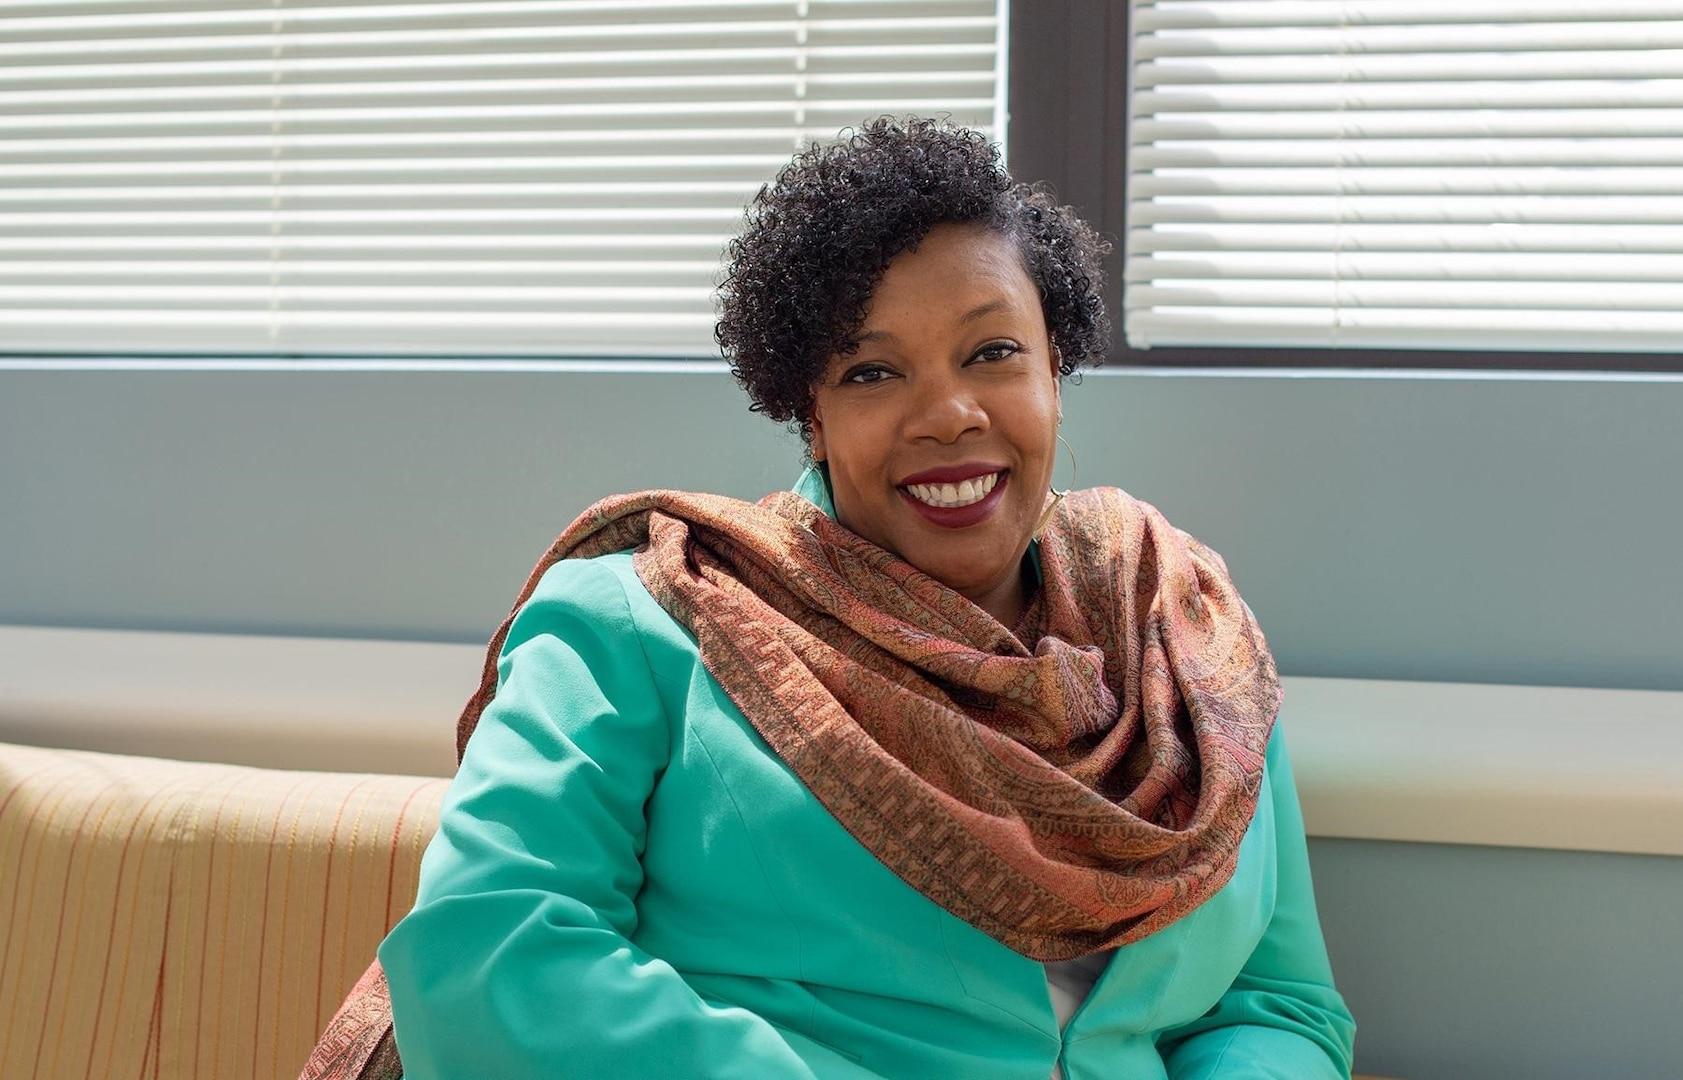 Deputy Chief Information Officer La'Naia Jones has enjoyed a career spent largely at NSA-Washington, not far from where she grew up near Annapolis, Maryland.